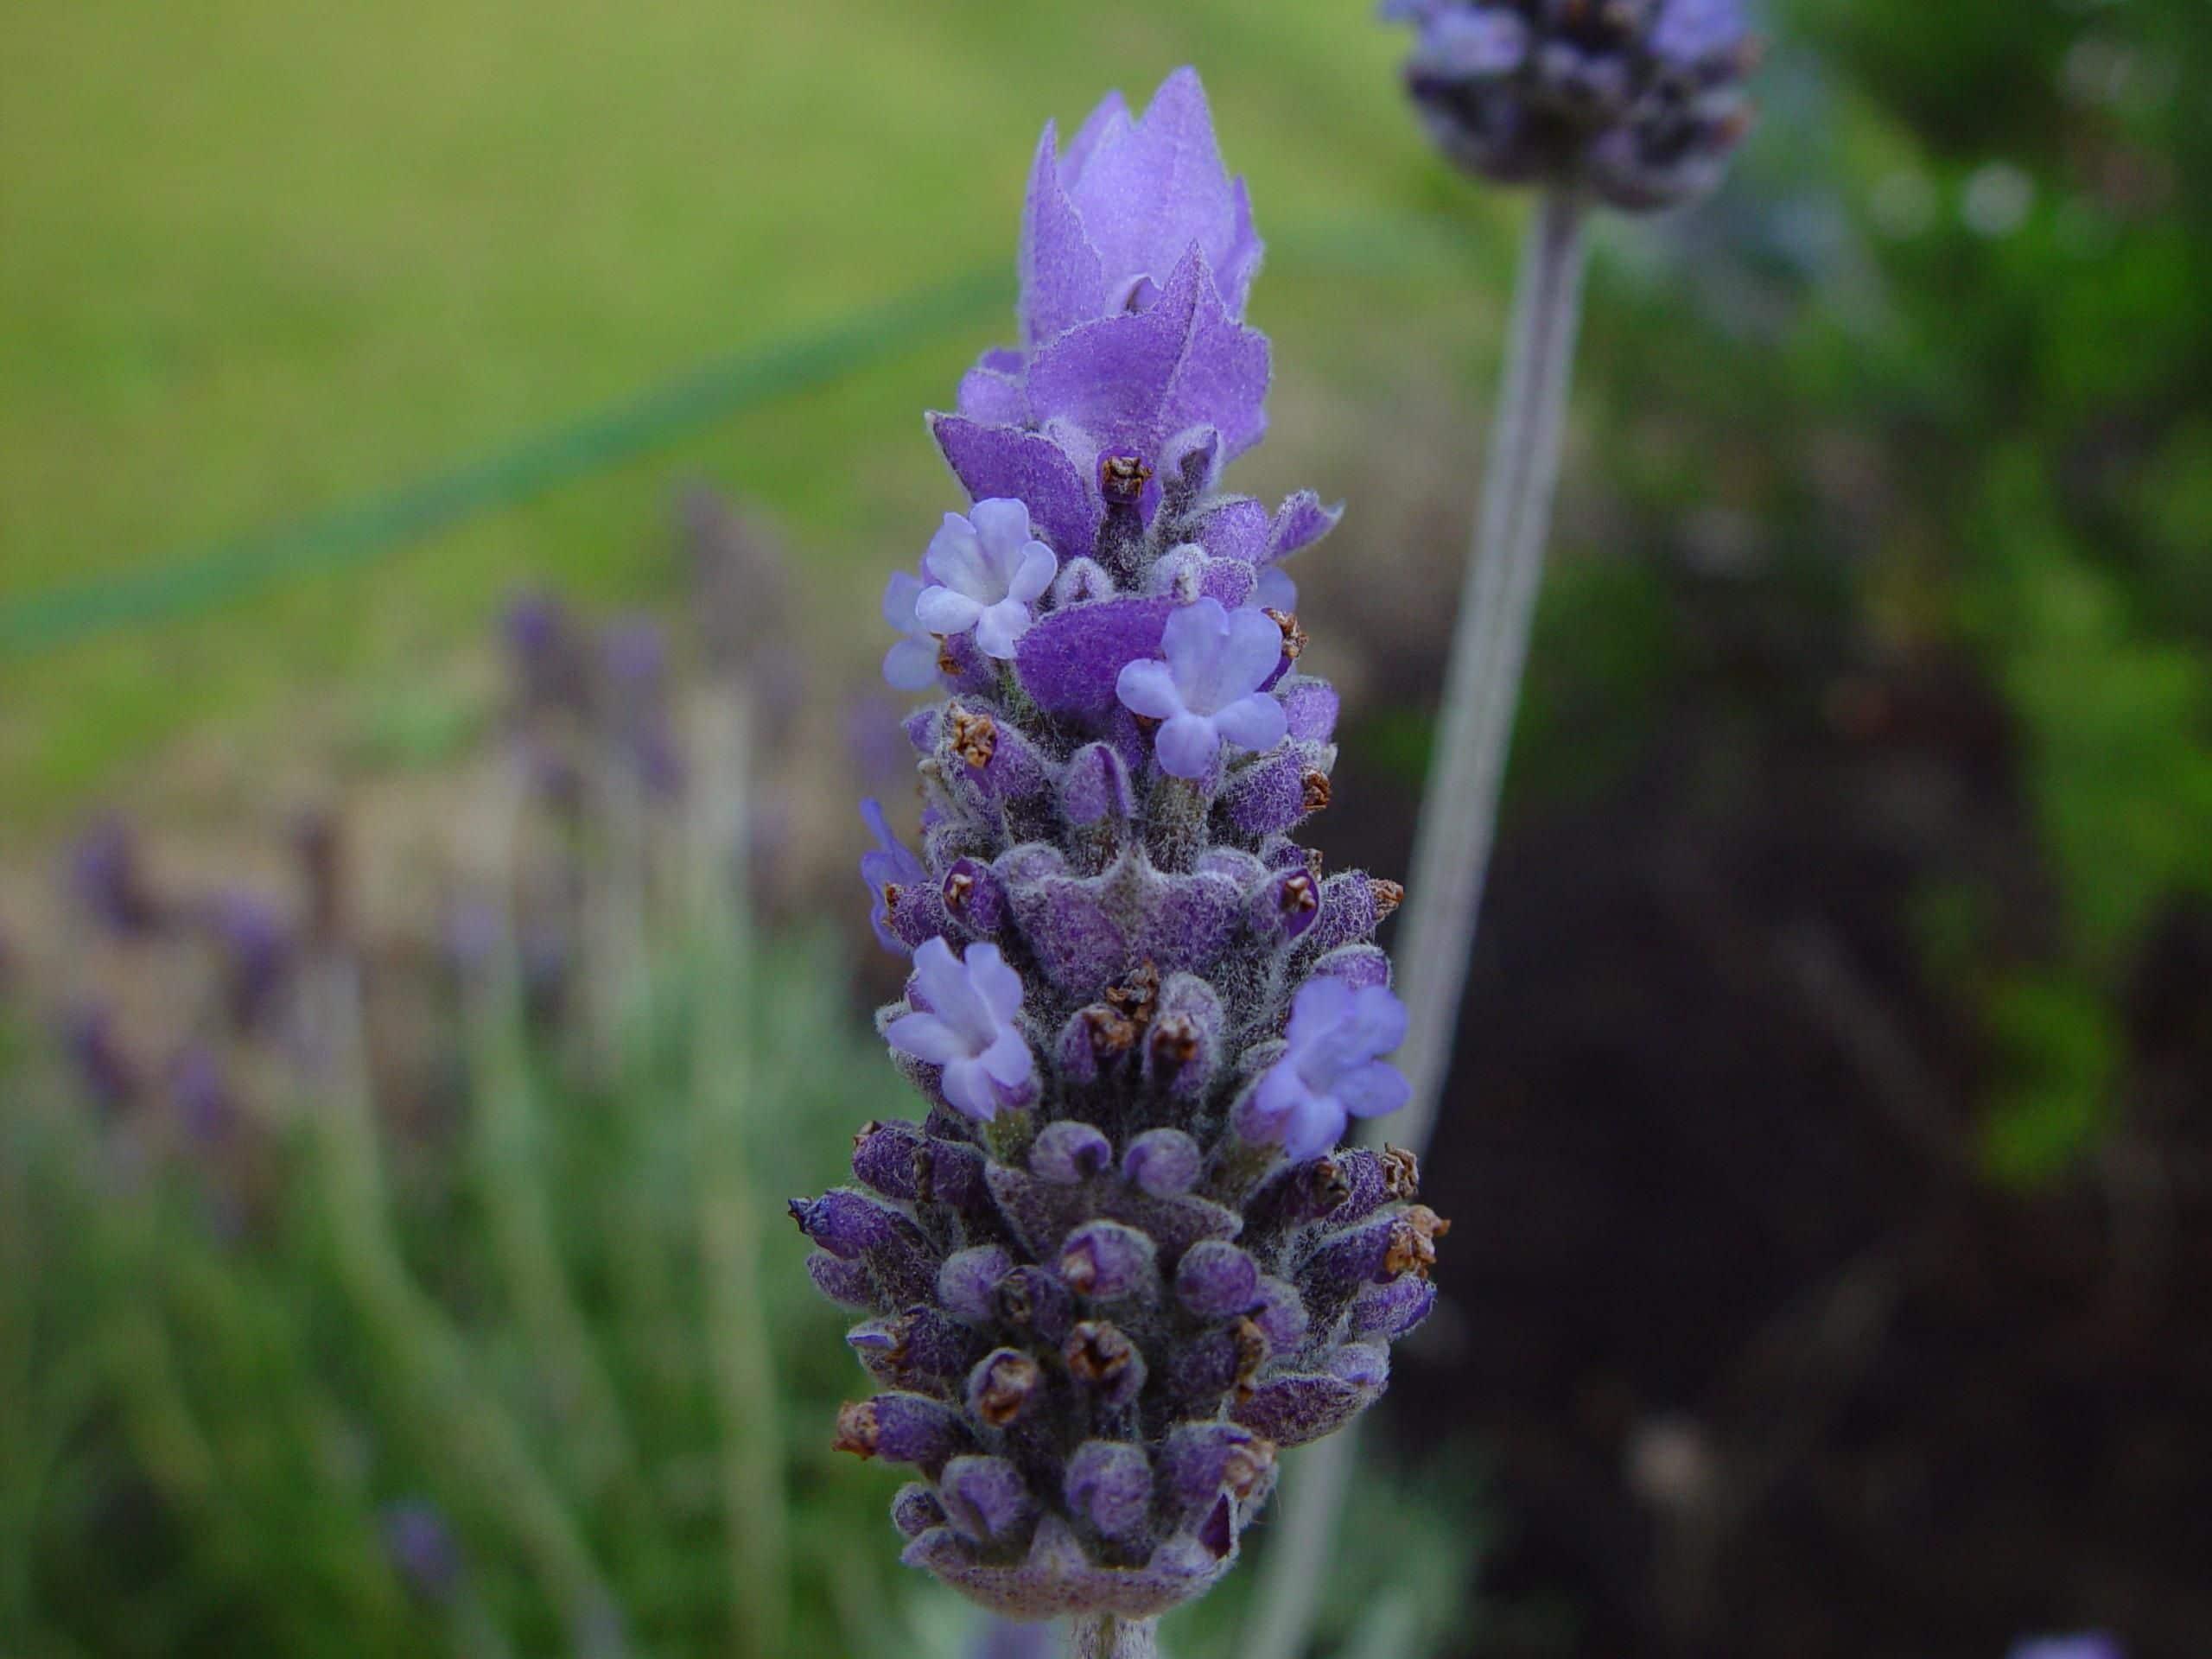 Lavender. (Lavandula).